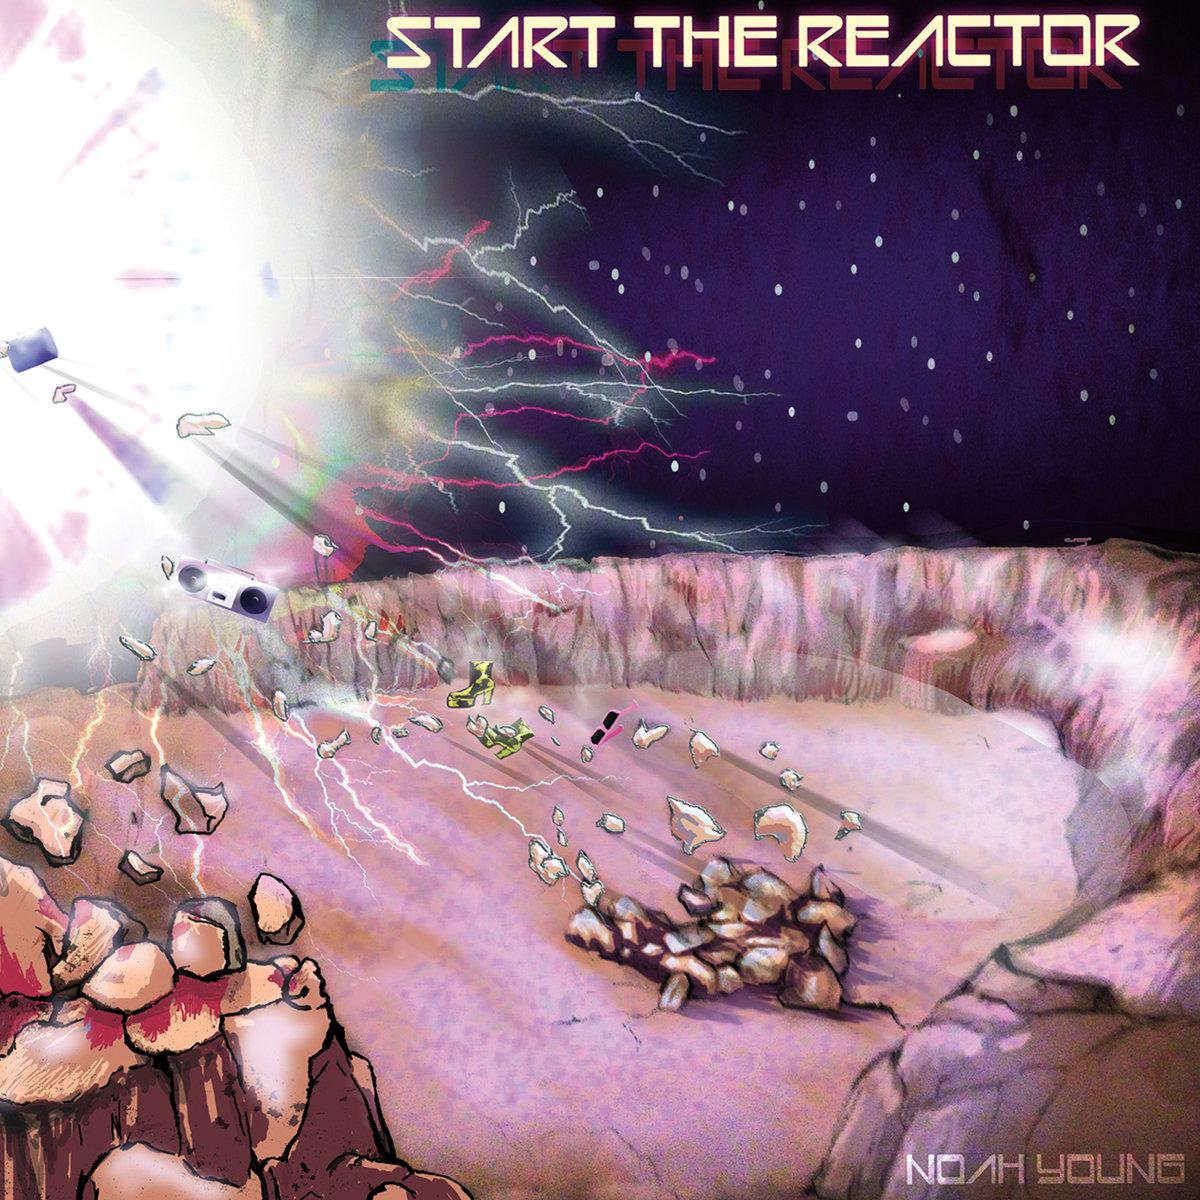 Noah Young  /  Start The Reactor